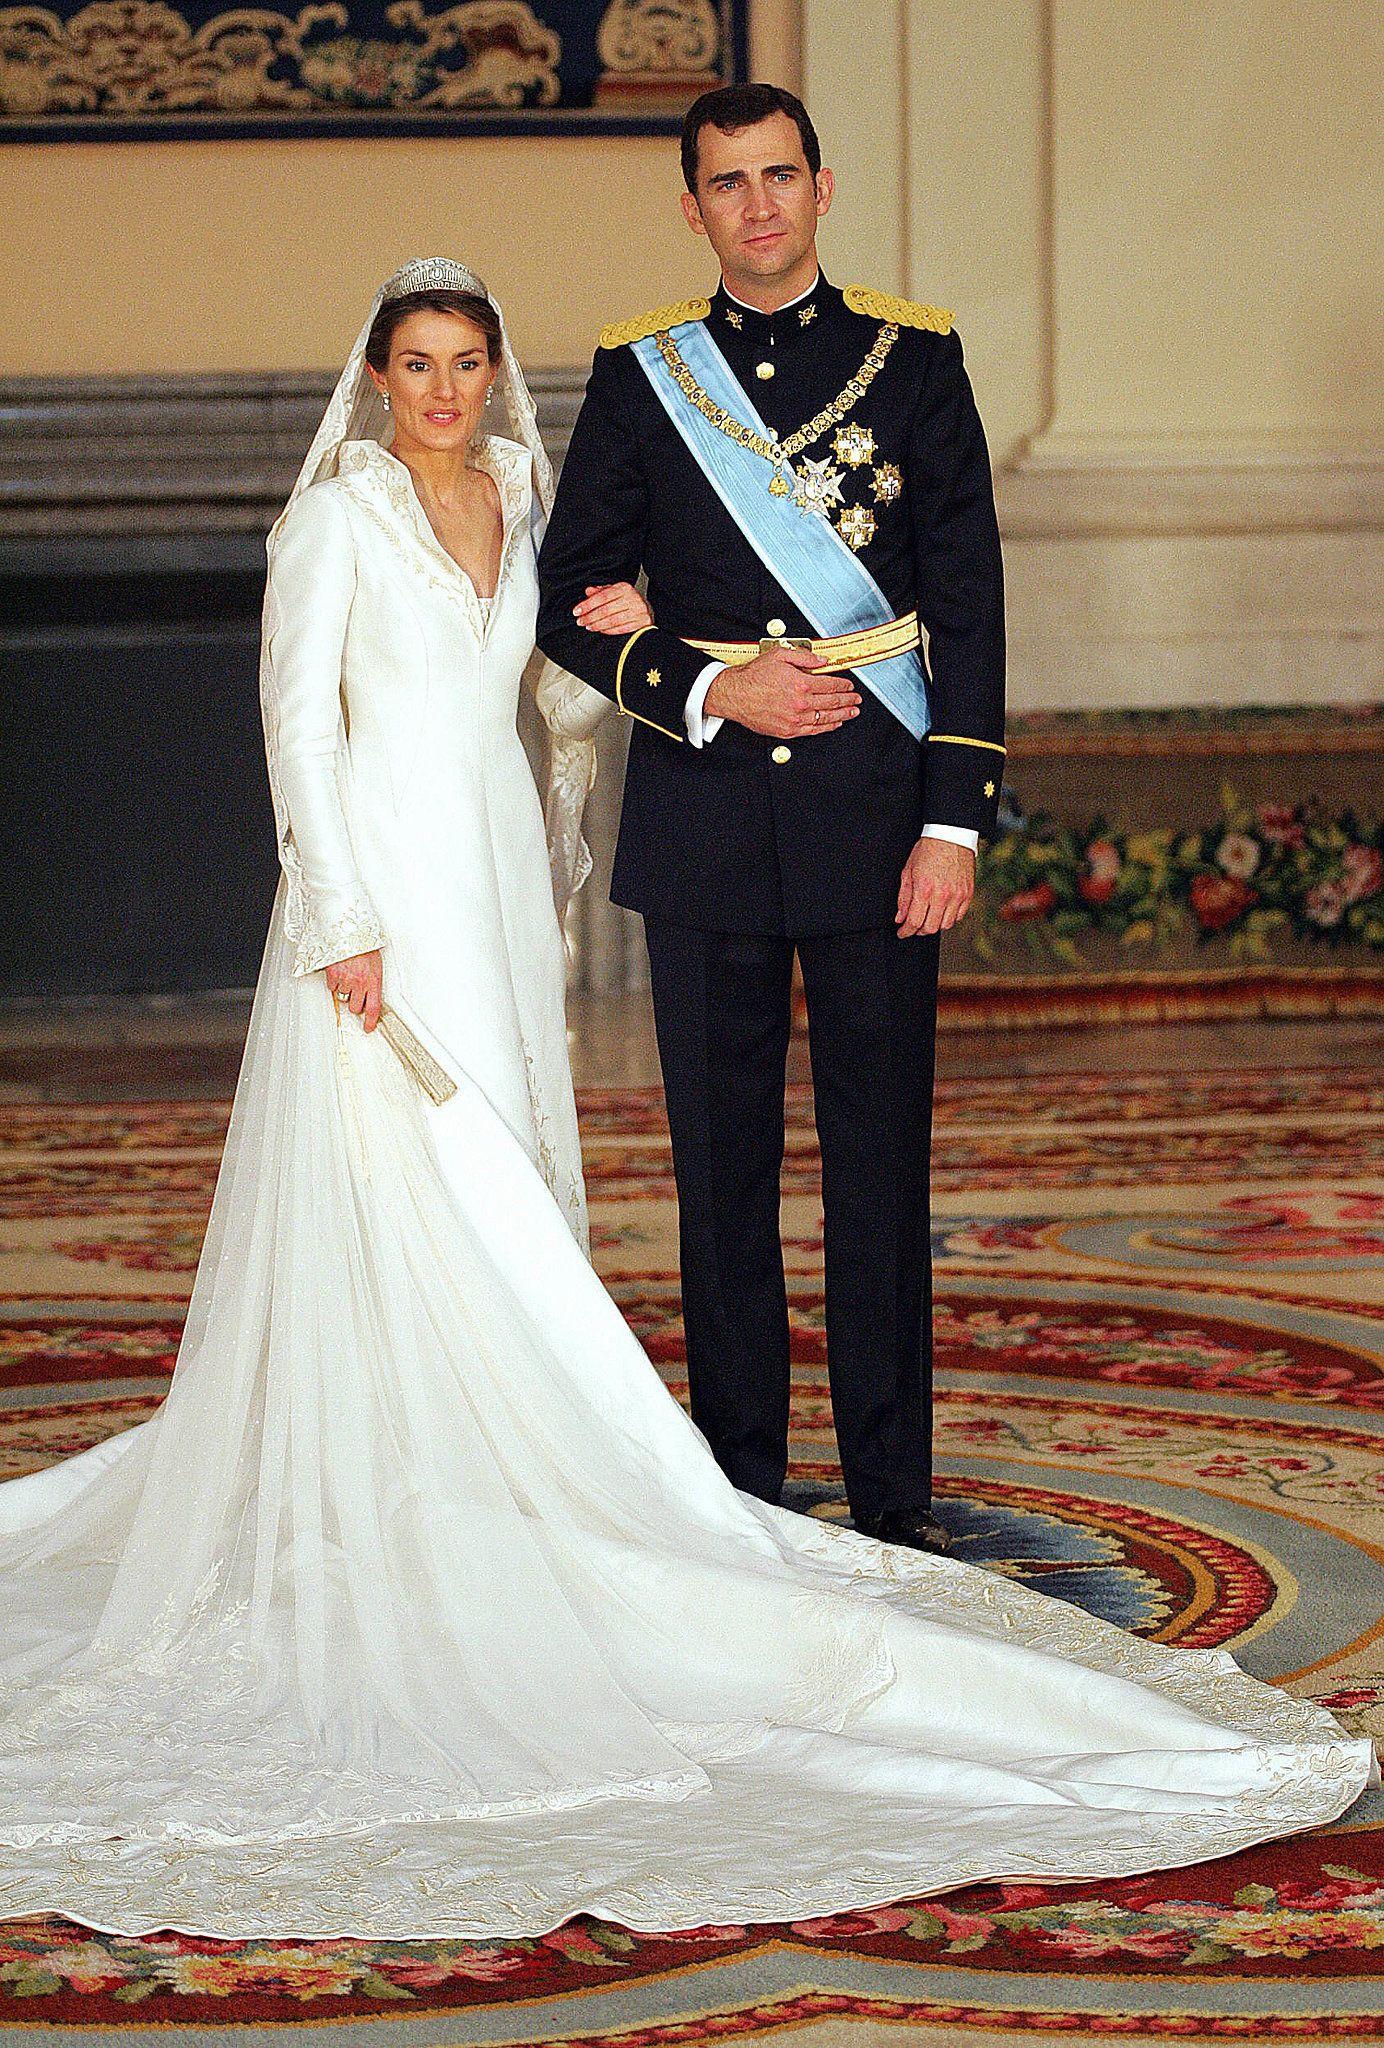 Get to Know Spain\'s Queen Letizia | Princess letizia, Princess and Spain